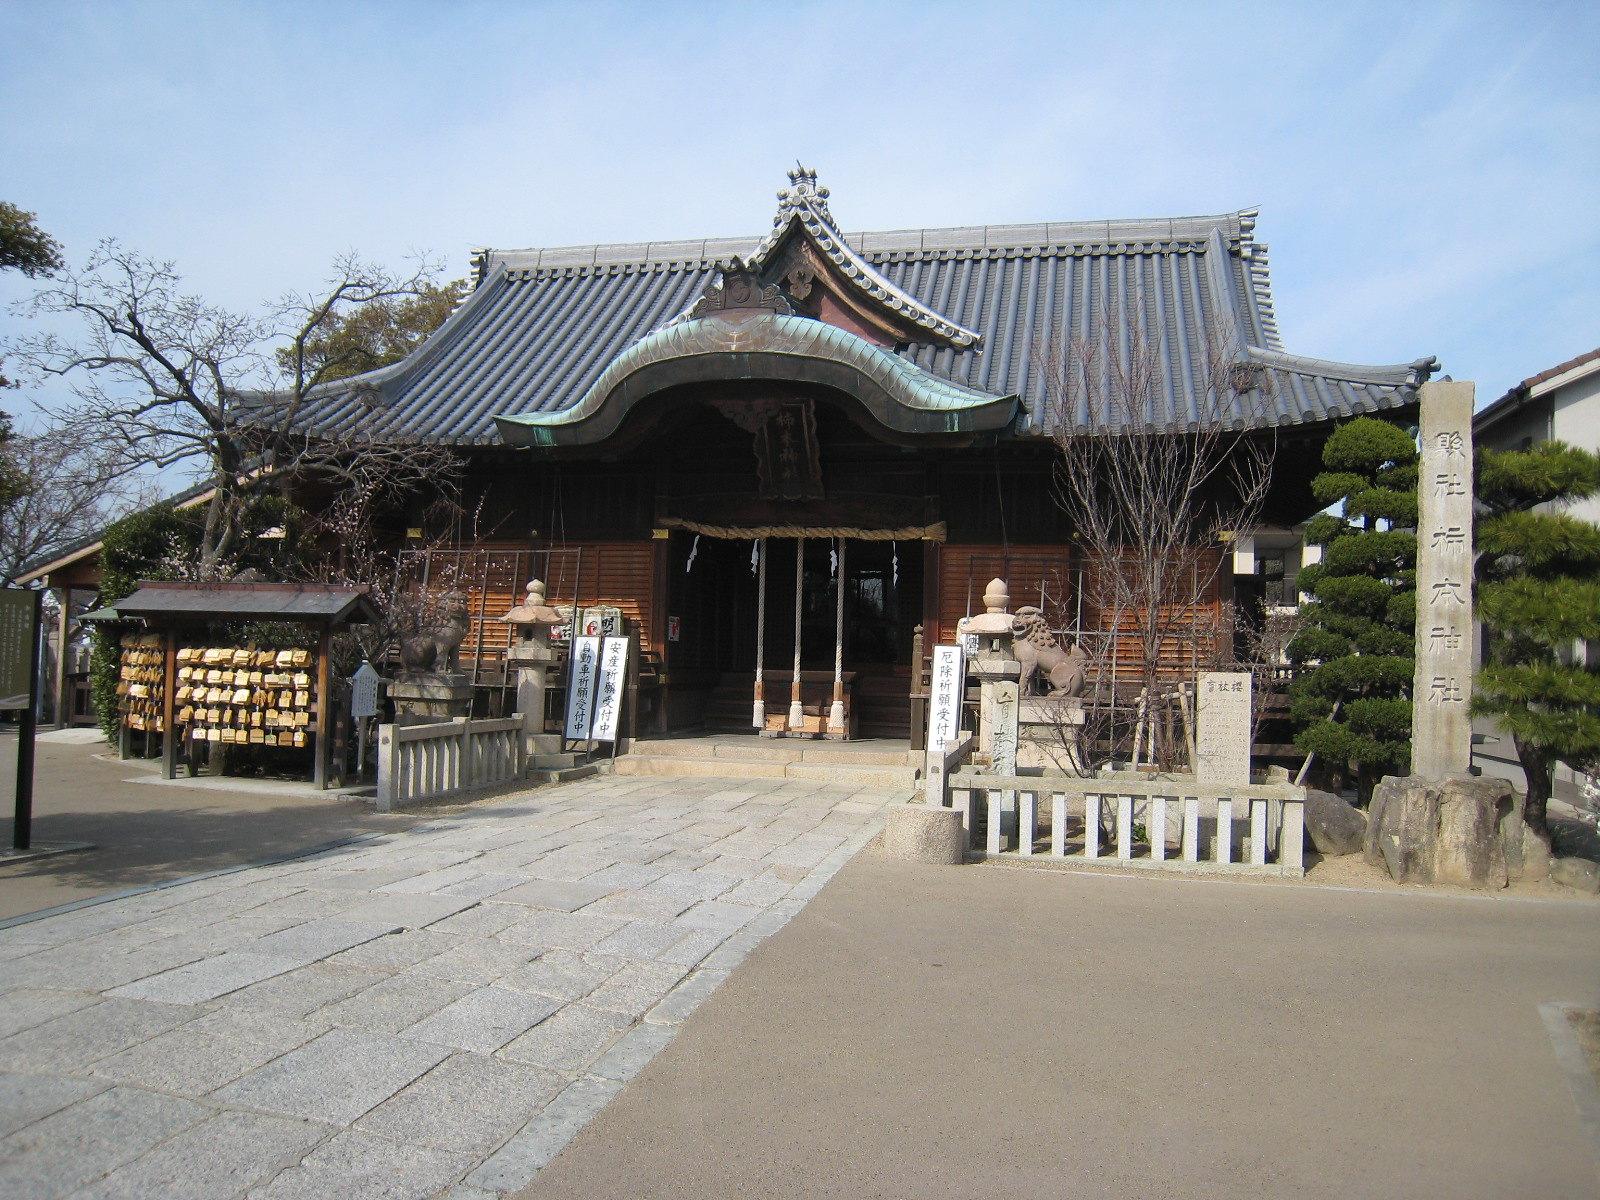 Kakinomoto Jinja in Akashi (Hyogo Pref.)